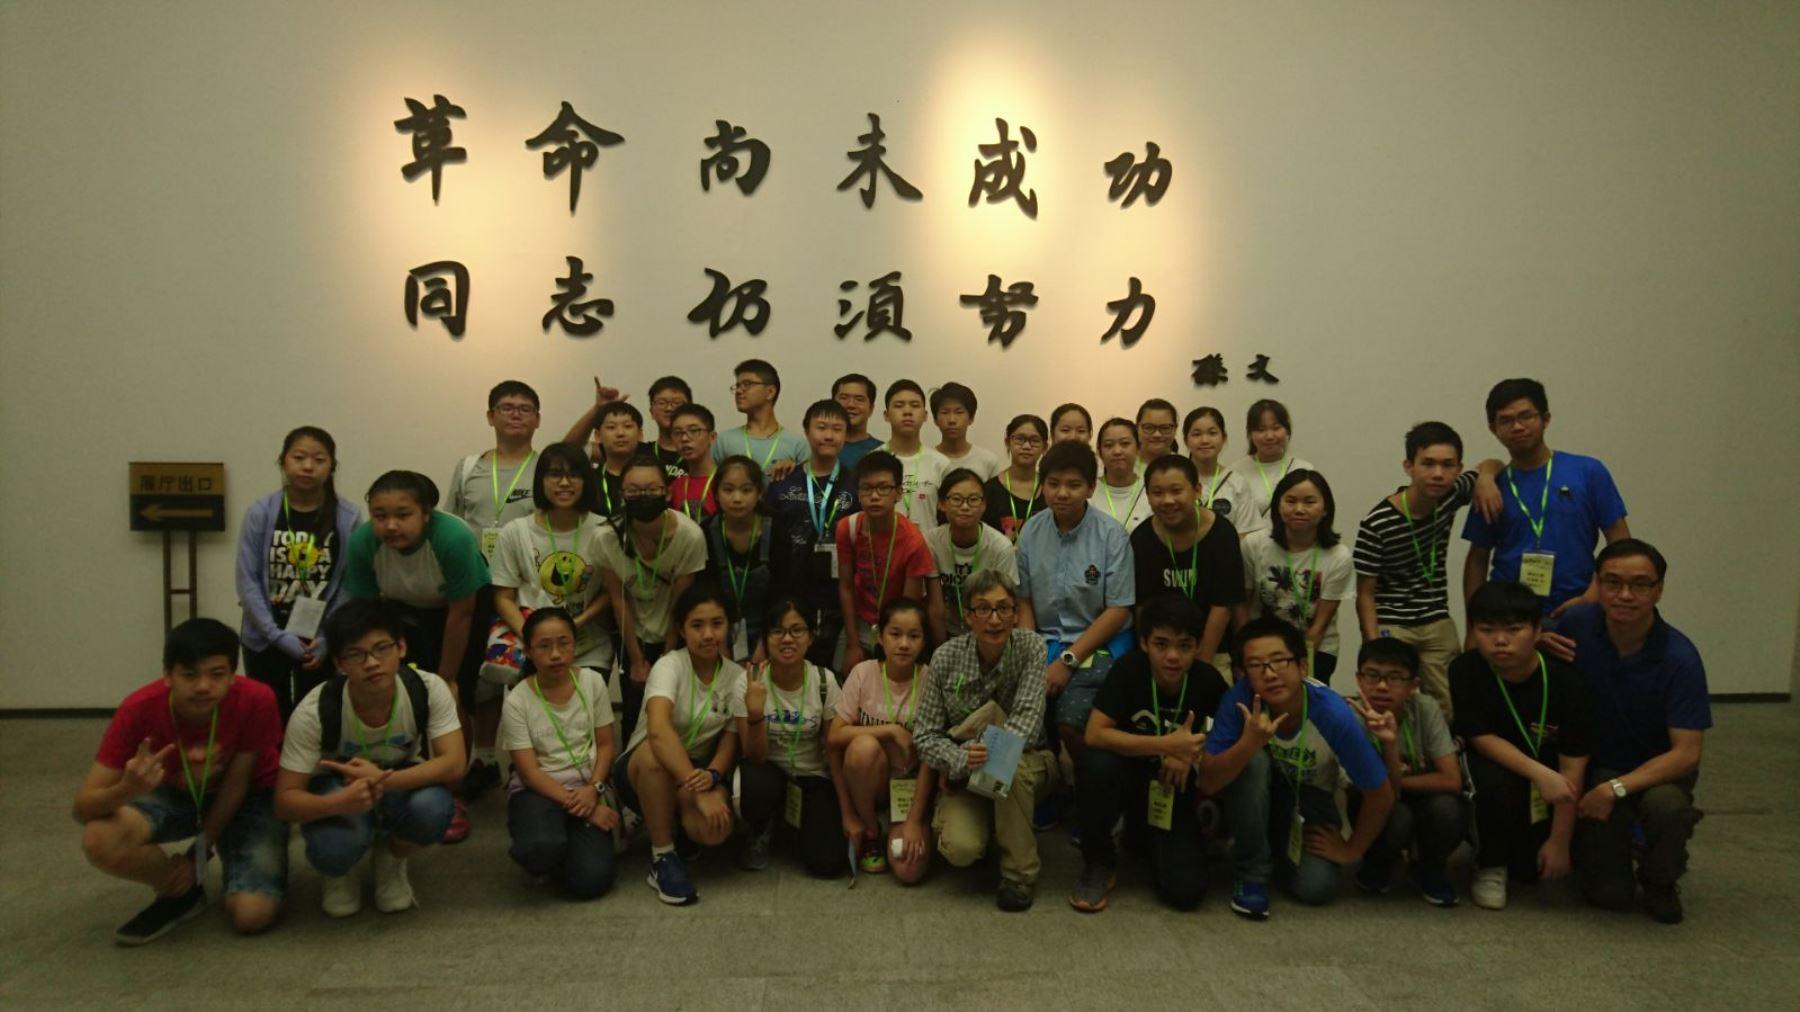 http://www.npc.edu.hk/sites/default/files/img-20170716-wa0015.jpg